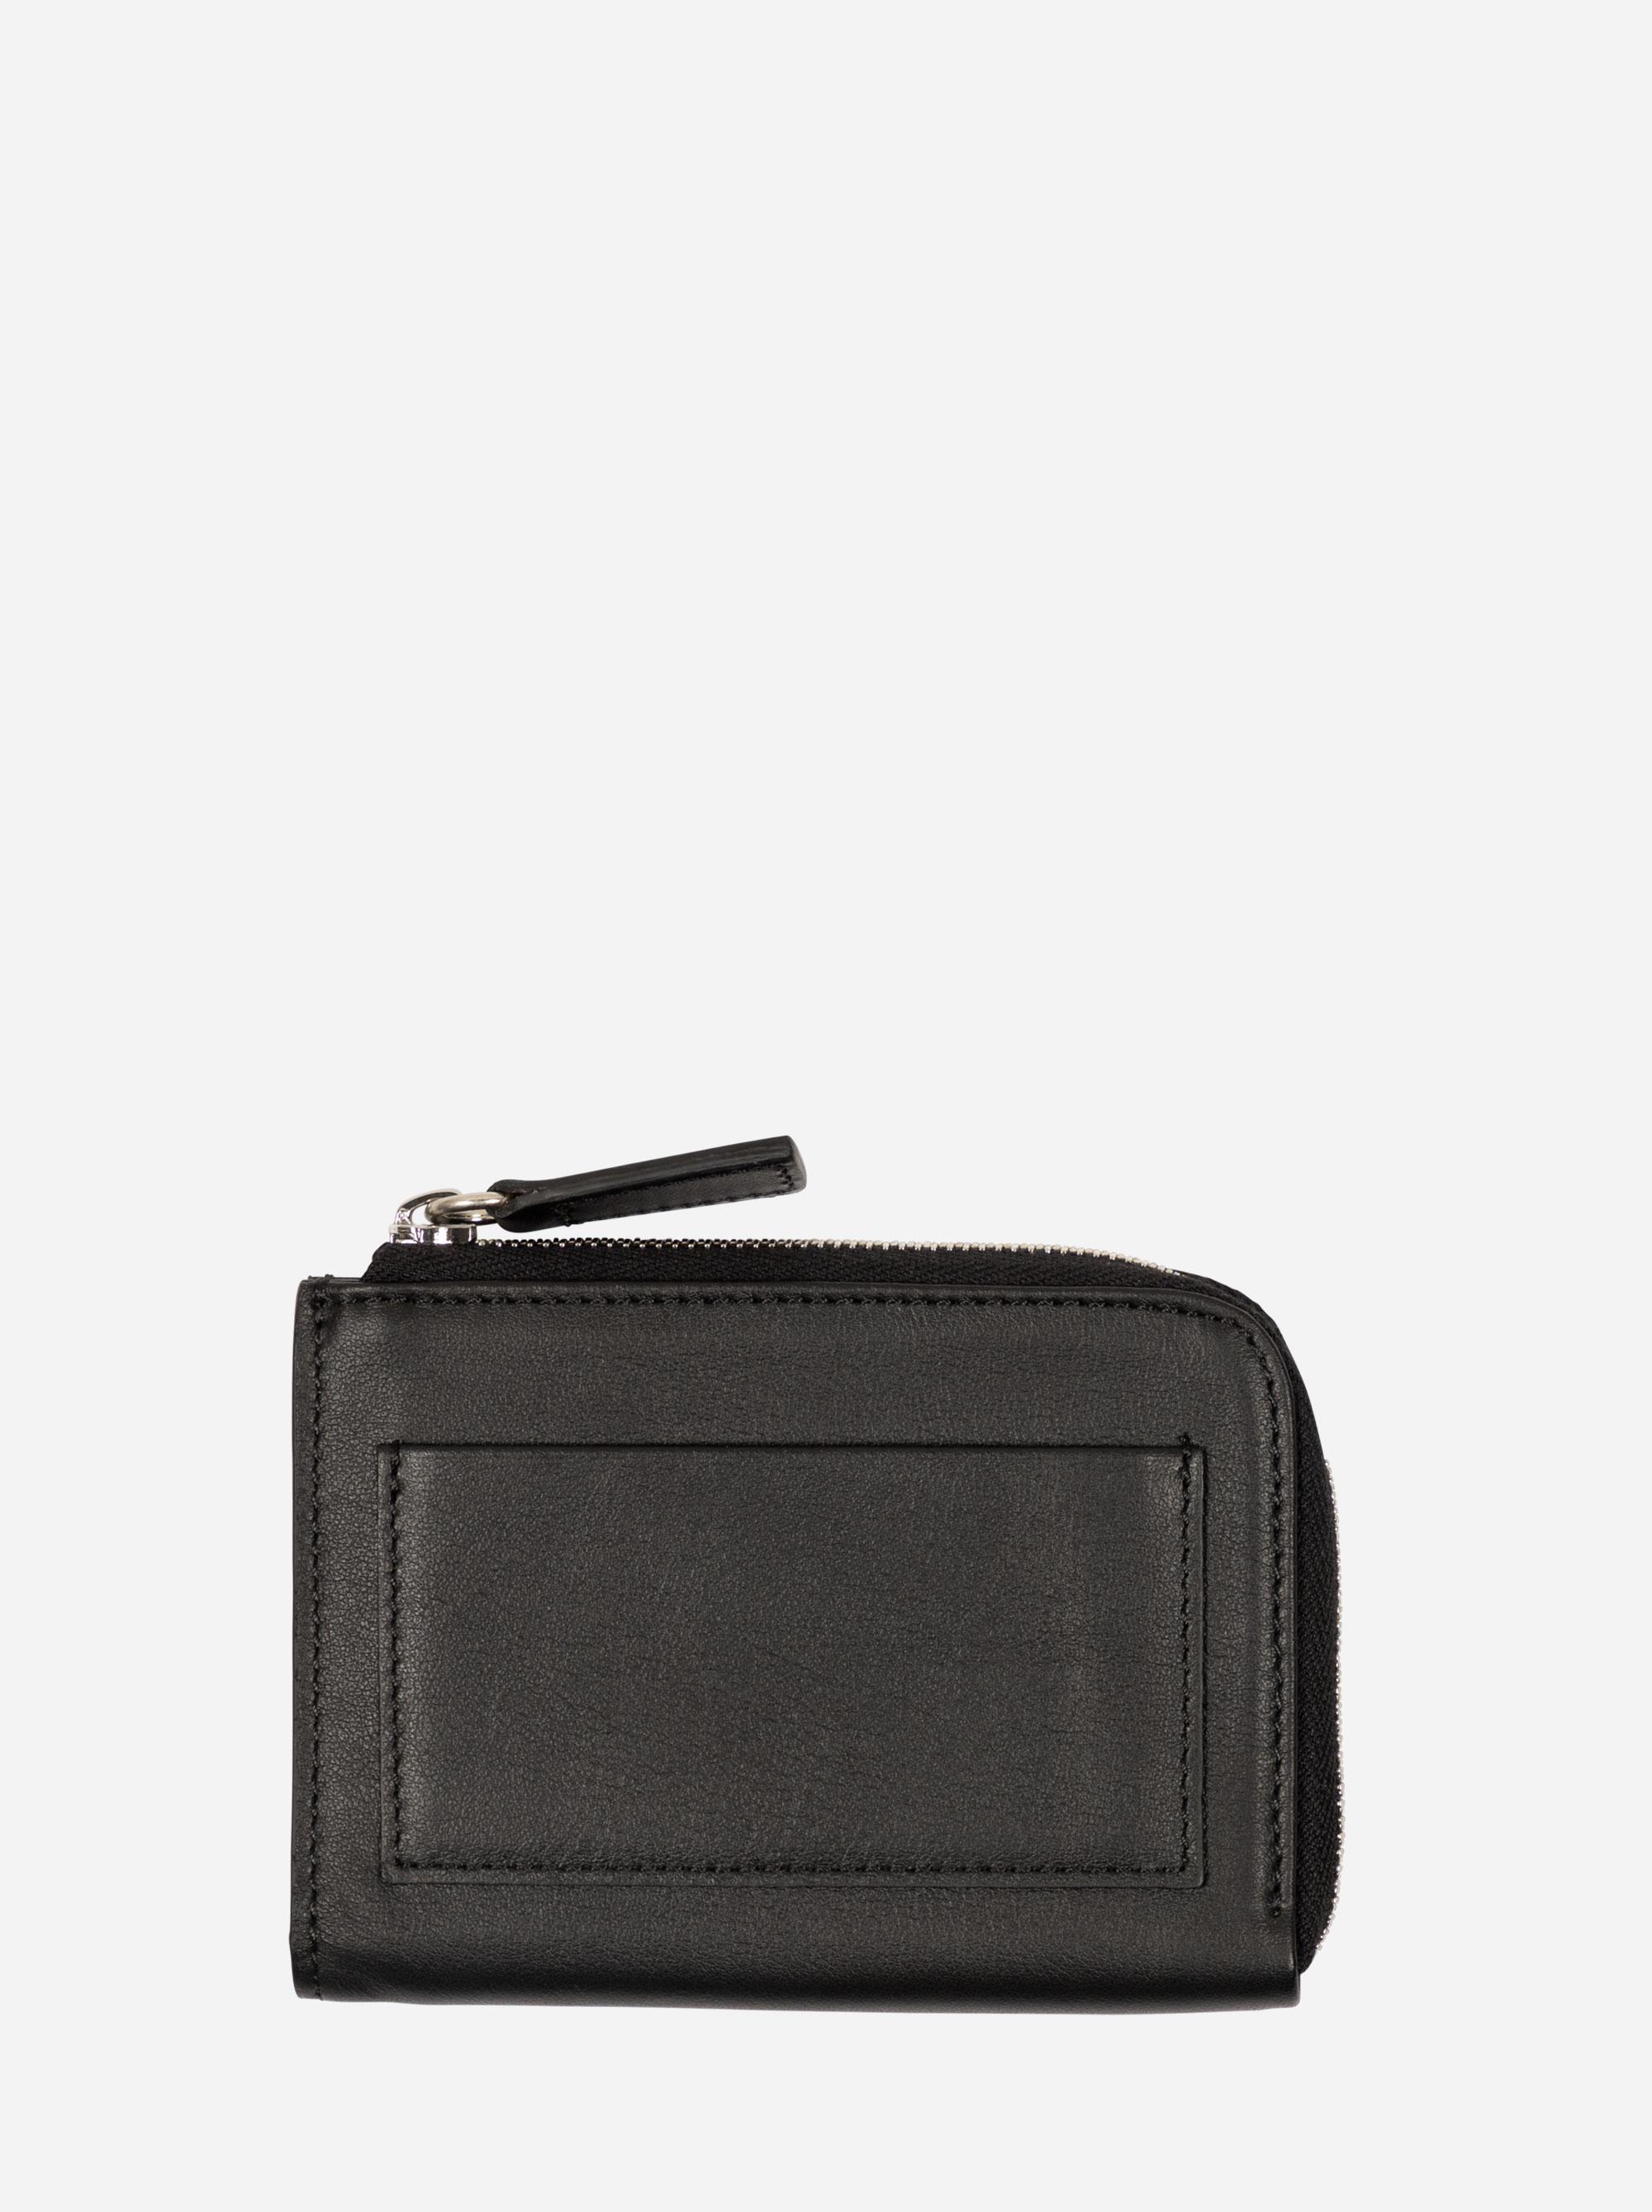 Teym - The Wallet - Black - 1